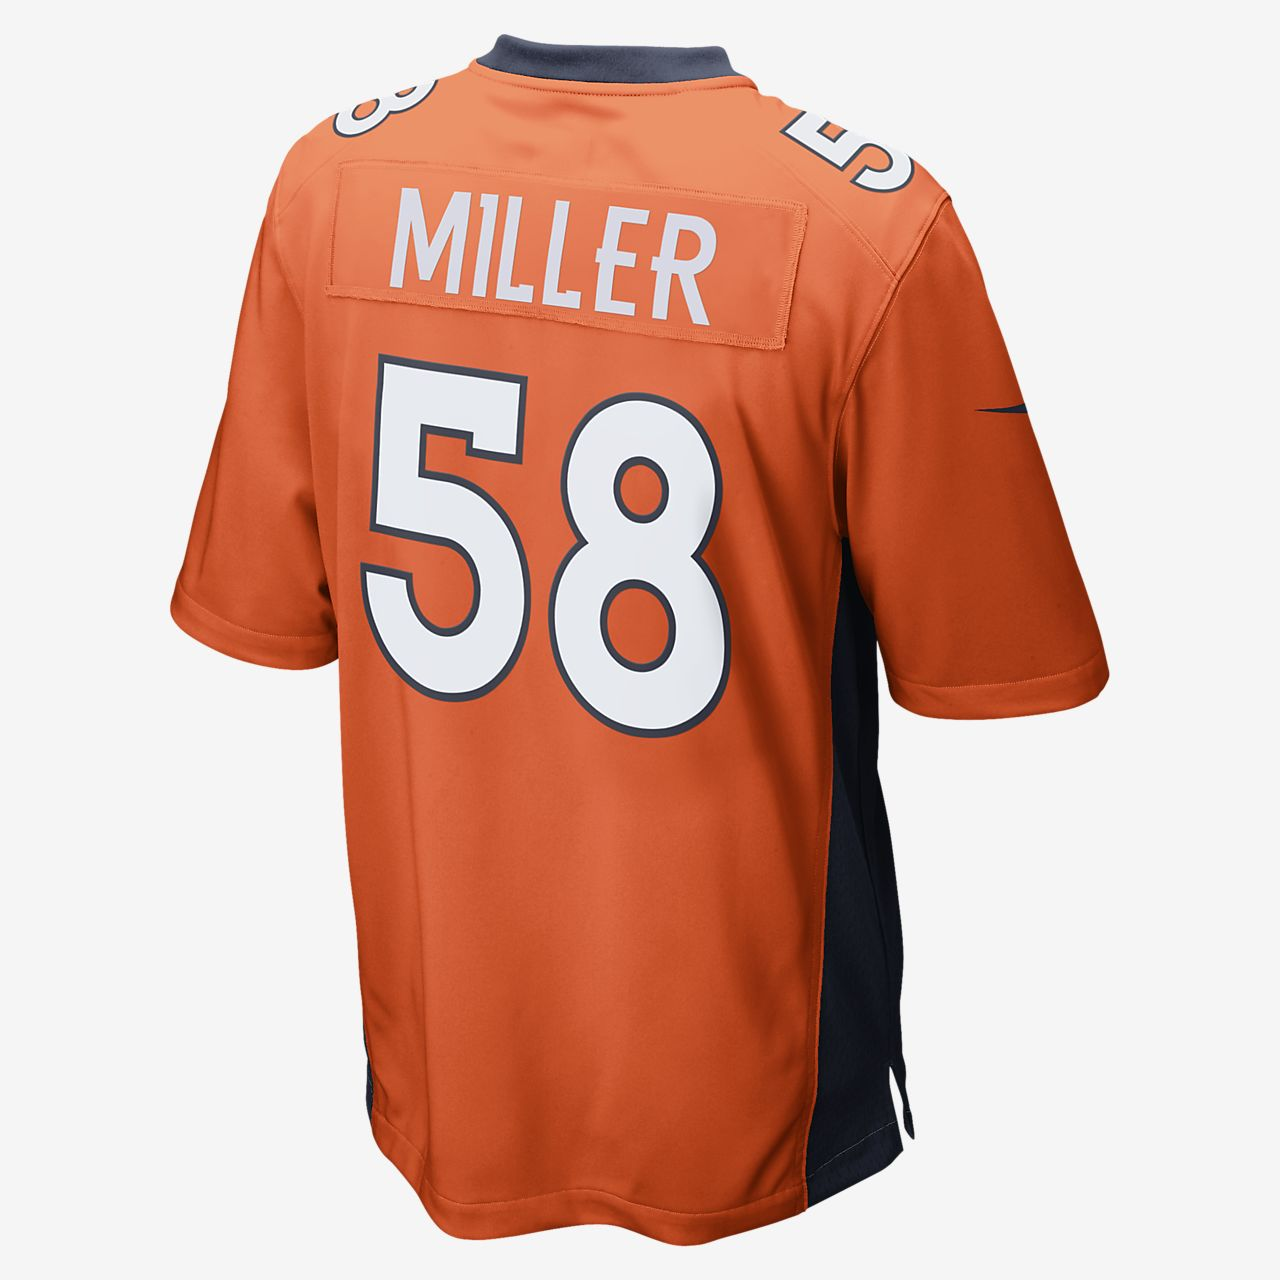 b8eeb5e46 NFL Denver Broncos (Von Miller) Men's American Football Home Game ...